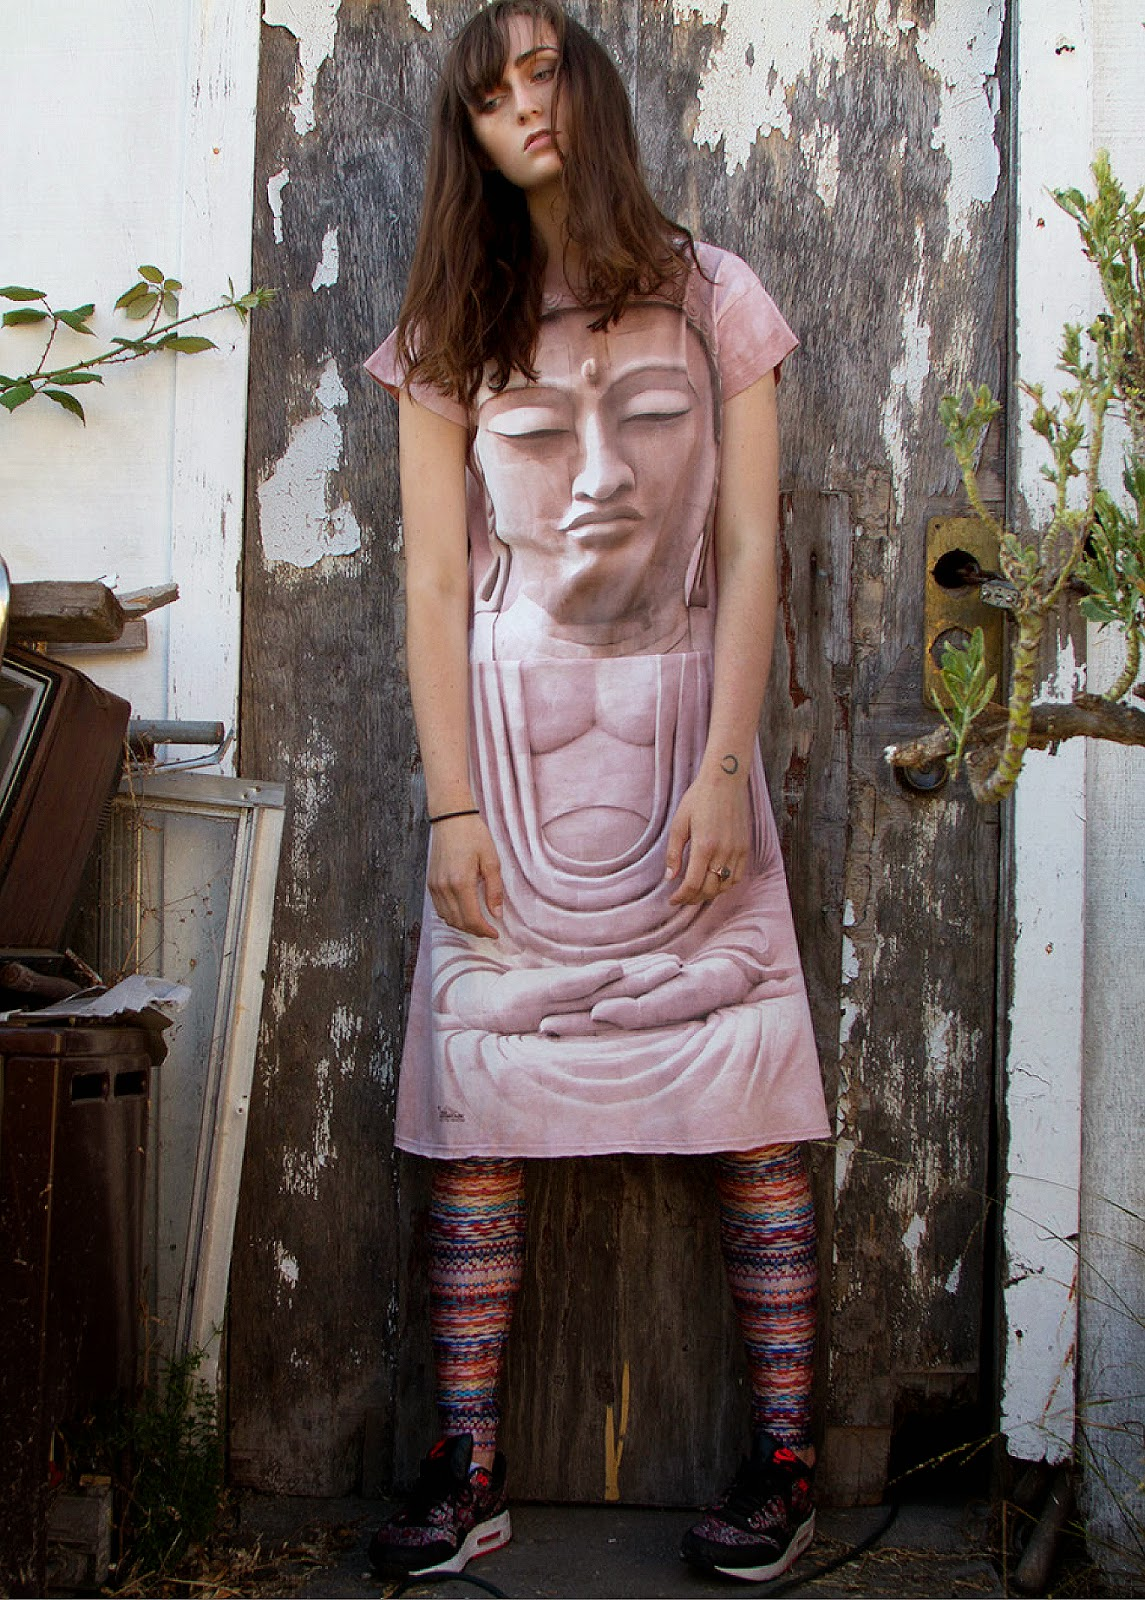 buddha face zen buddhism casual t-shirt dress hippie tie dye idilvice